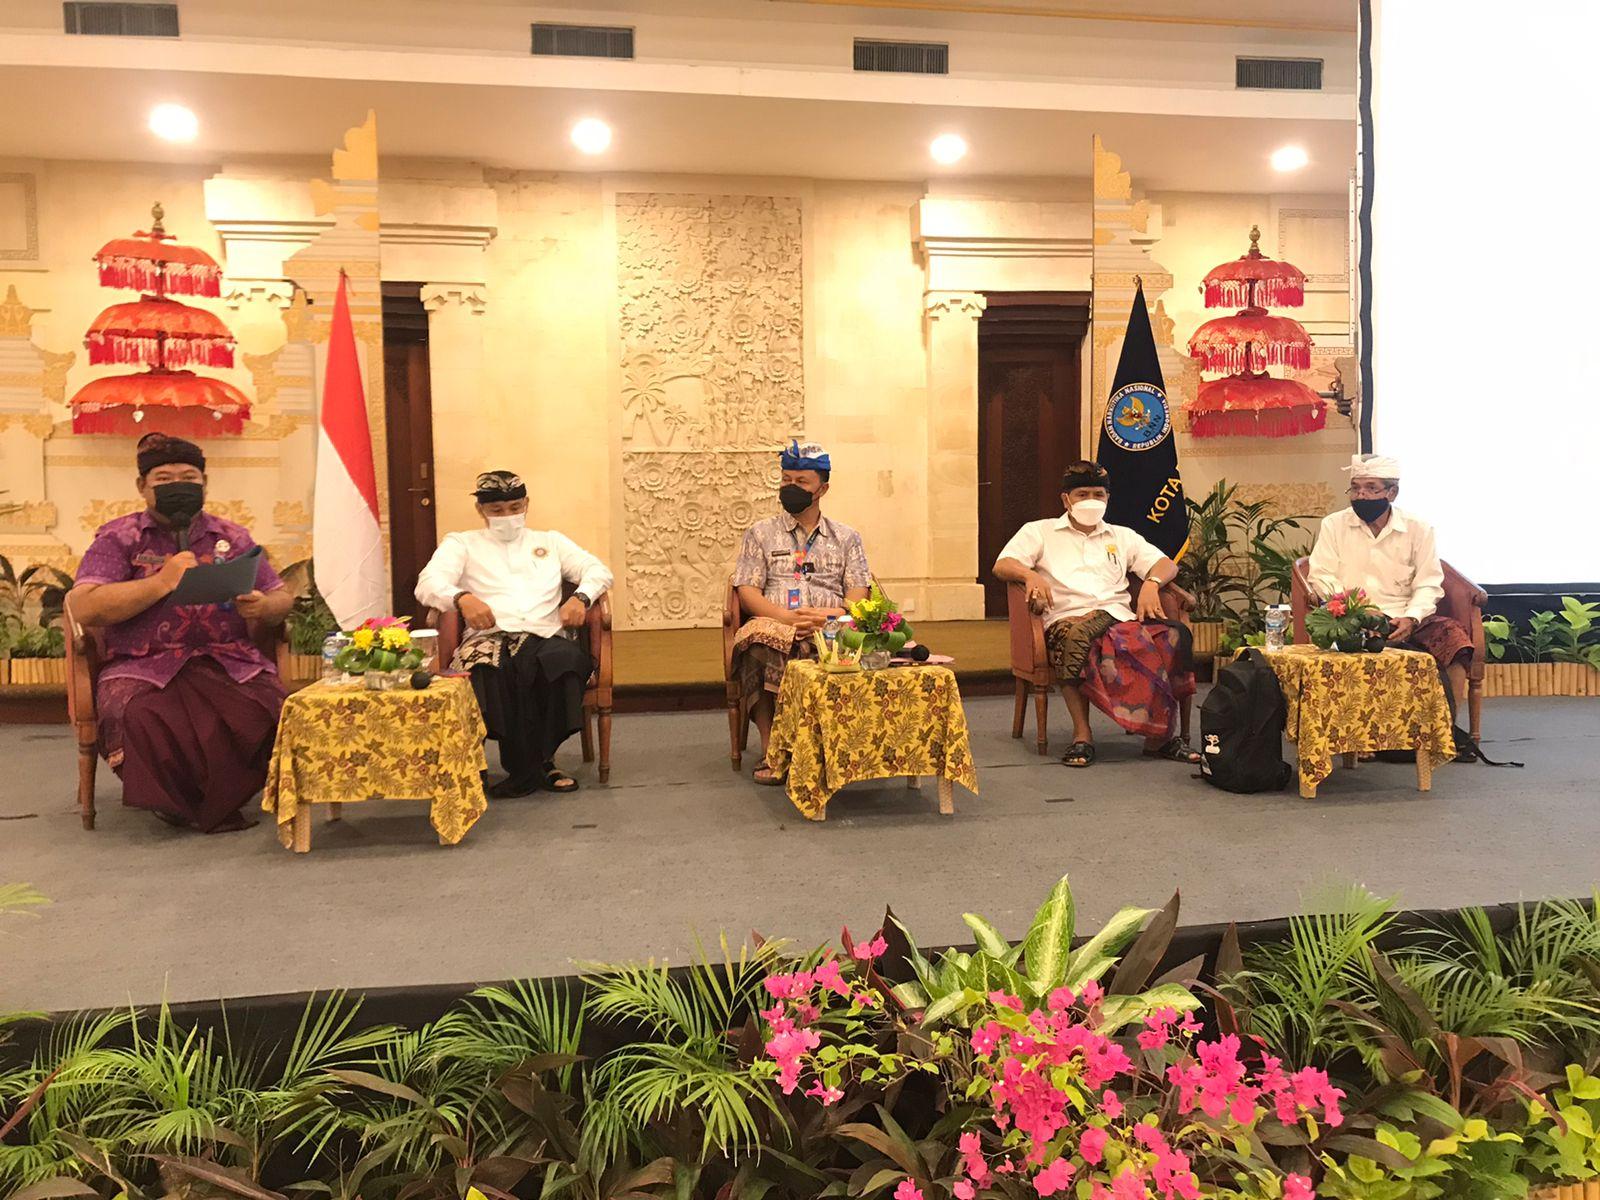 KEGIATAN ''Pengembangan Kapasitas P4GN Pada Lembaga Adat dan Komunitas Berbasis Kearifan Lokal'' yang digelar BNN Kota Denpasar di Sanur, Jumat (24/9/2021). Foto: ist